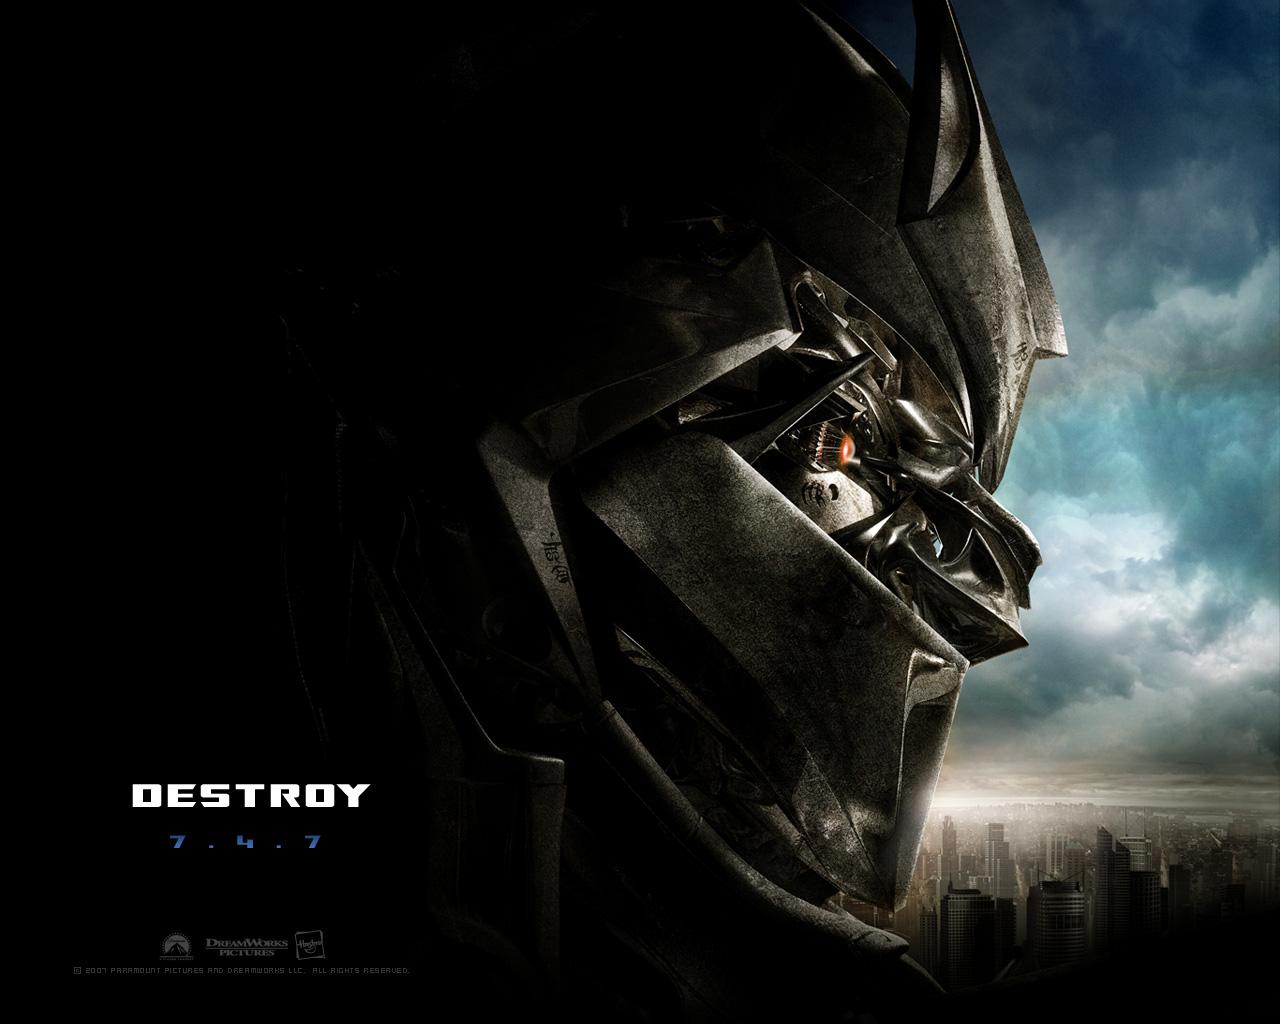 Transformers Movie: Megatron - Transformers Wallpaper (35015) - Fanpop